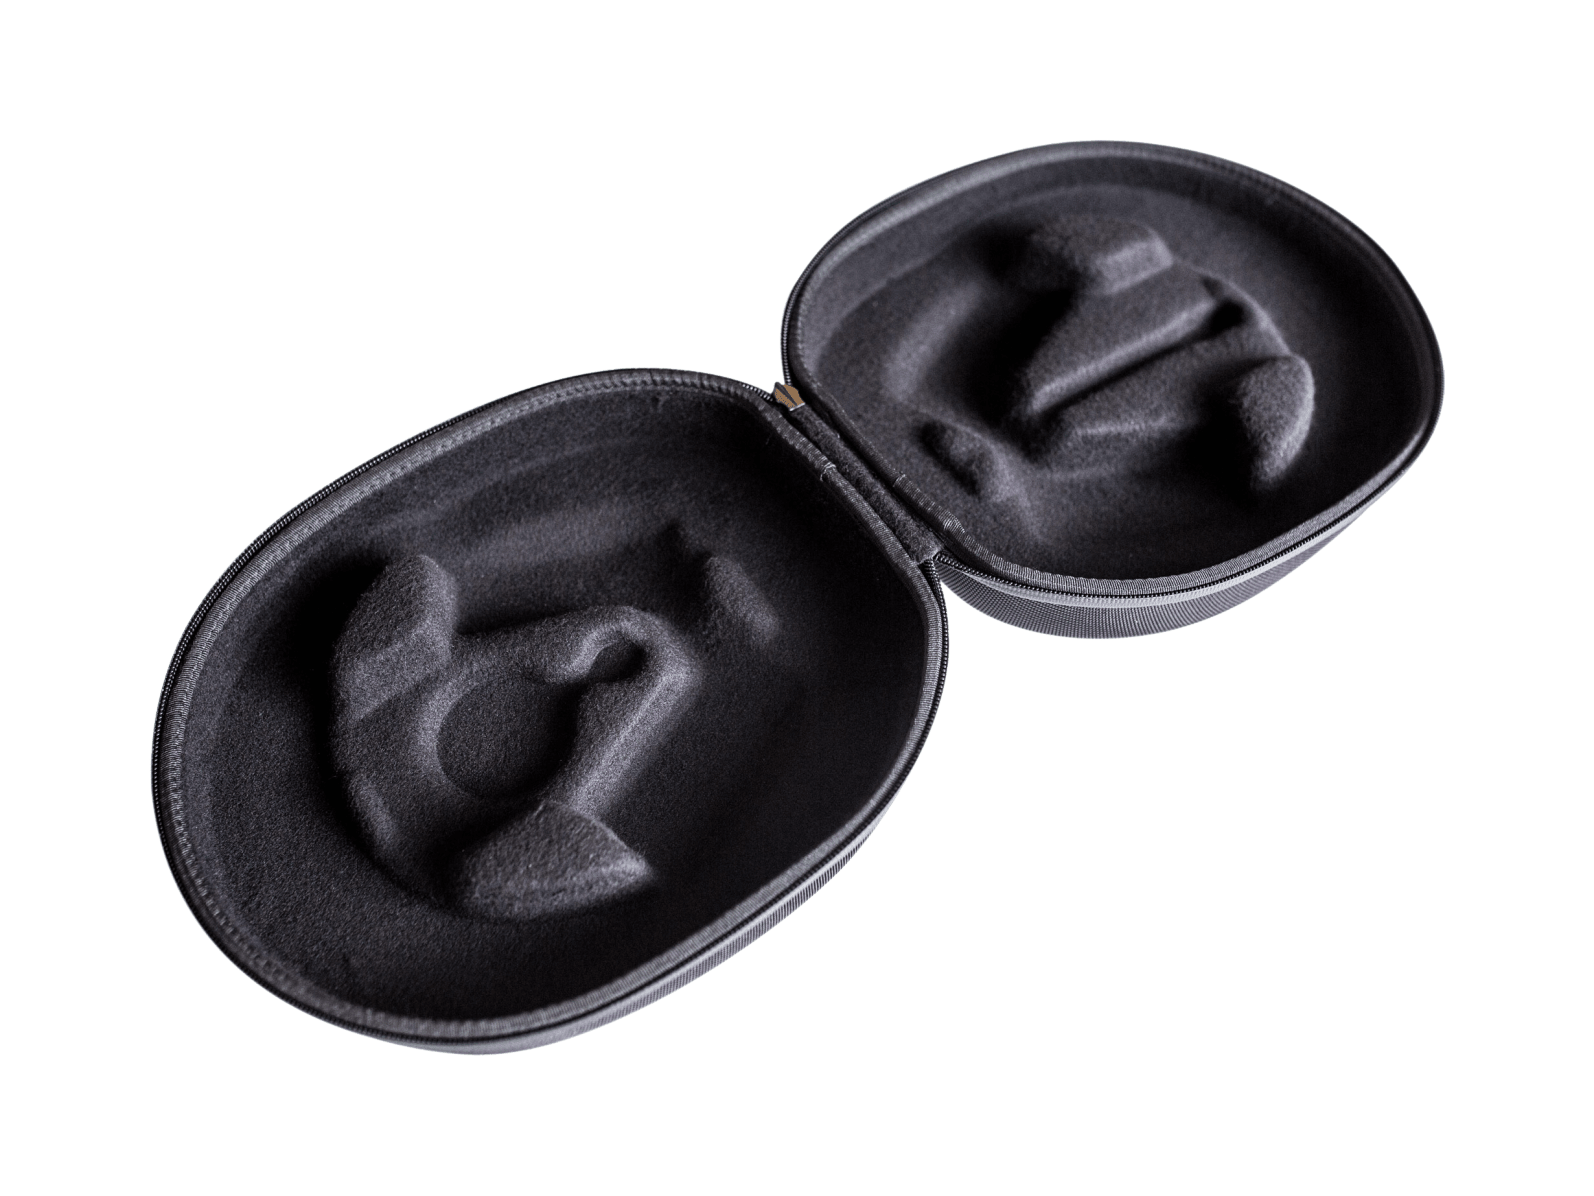 headset-case-gallery-02